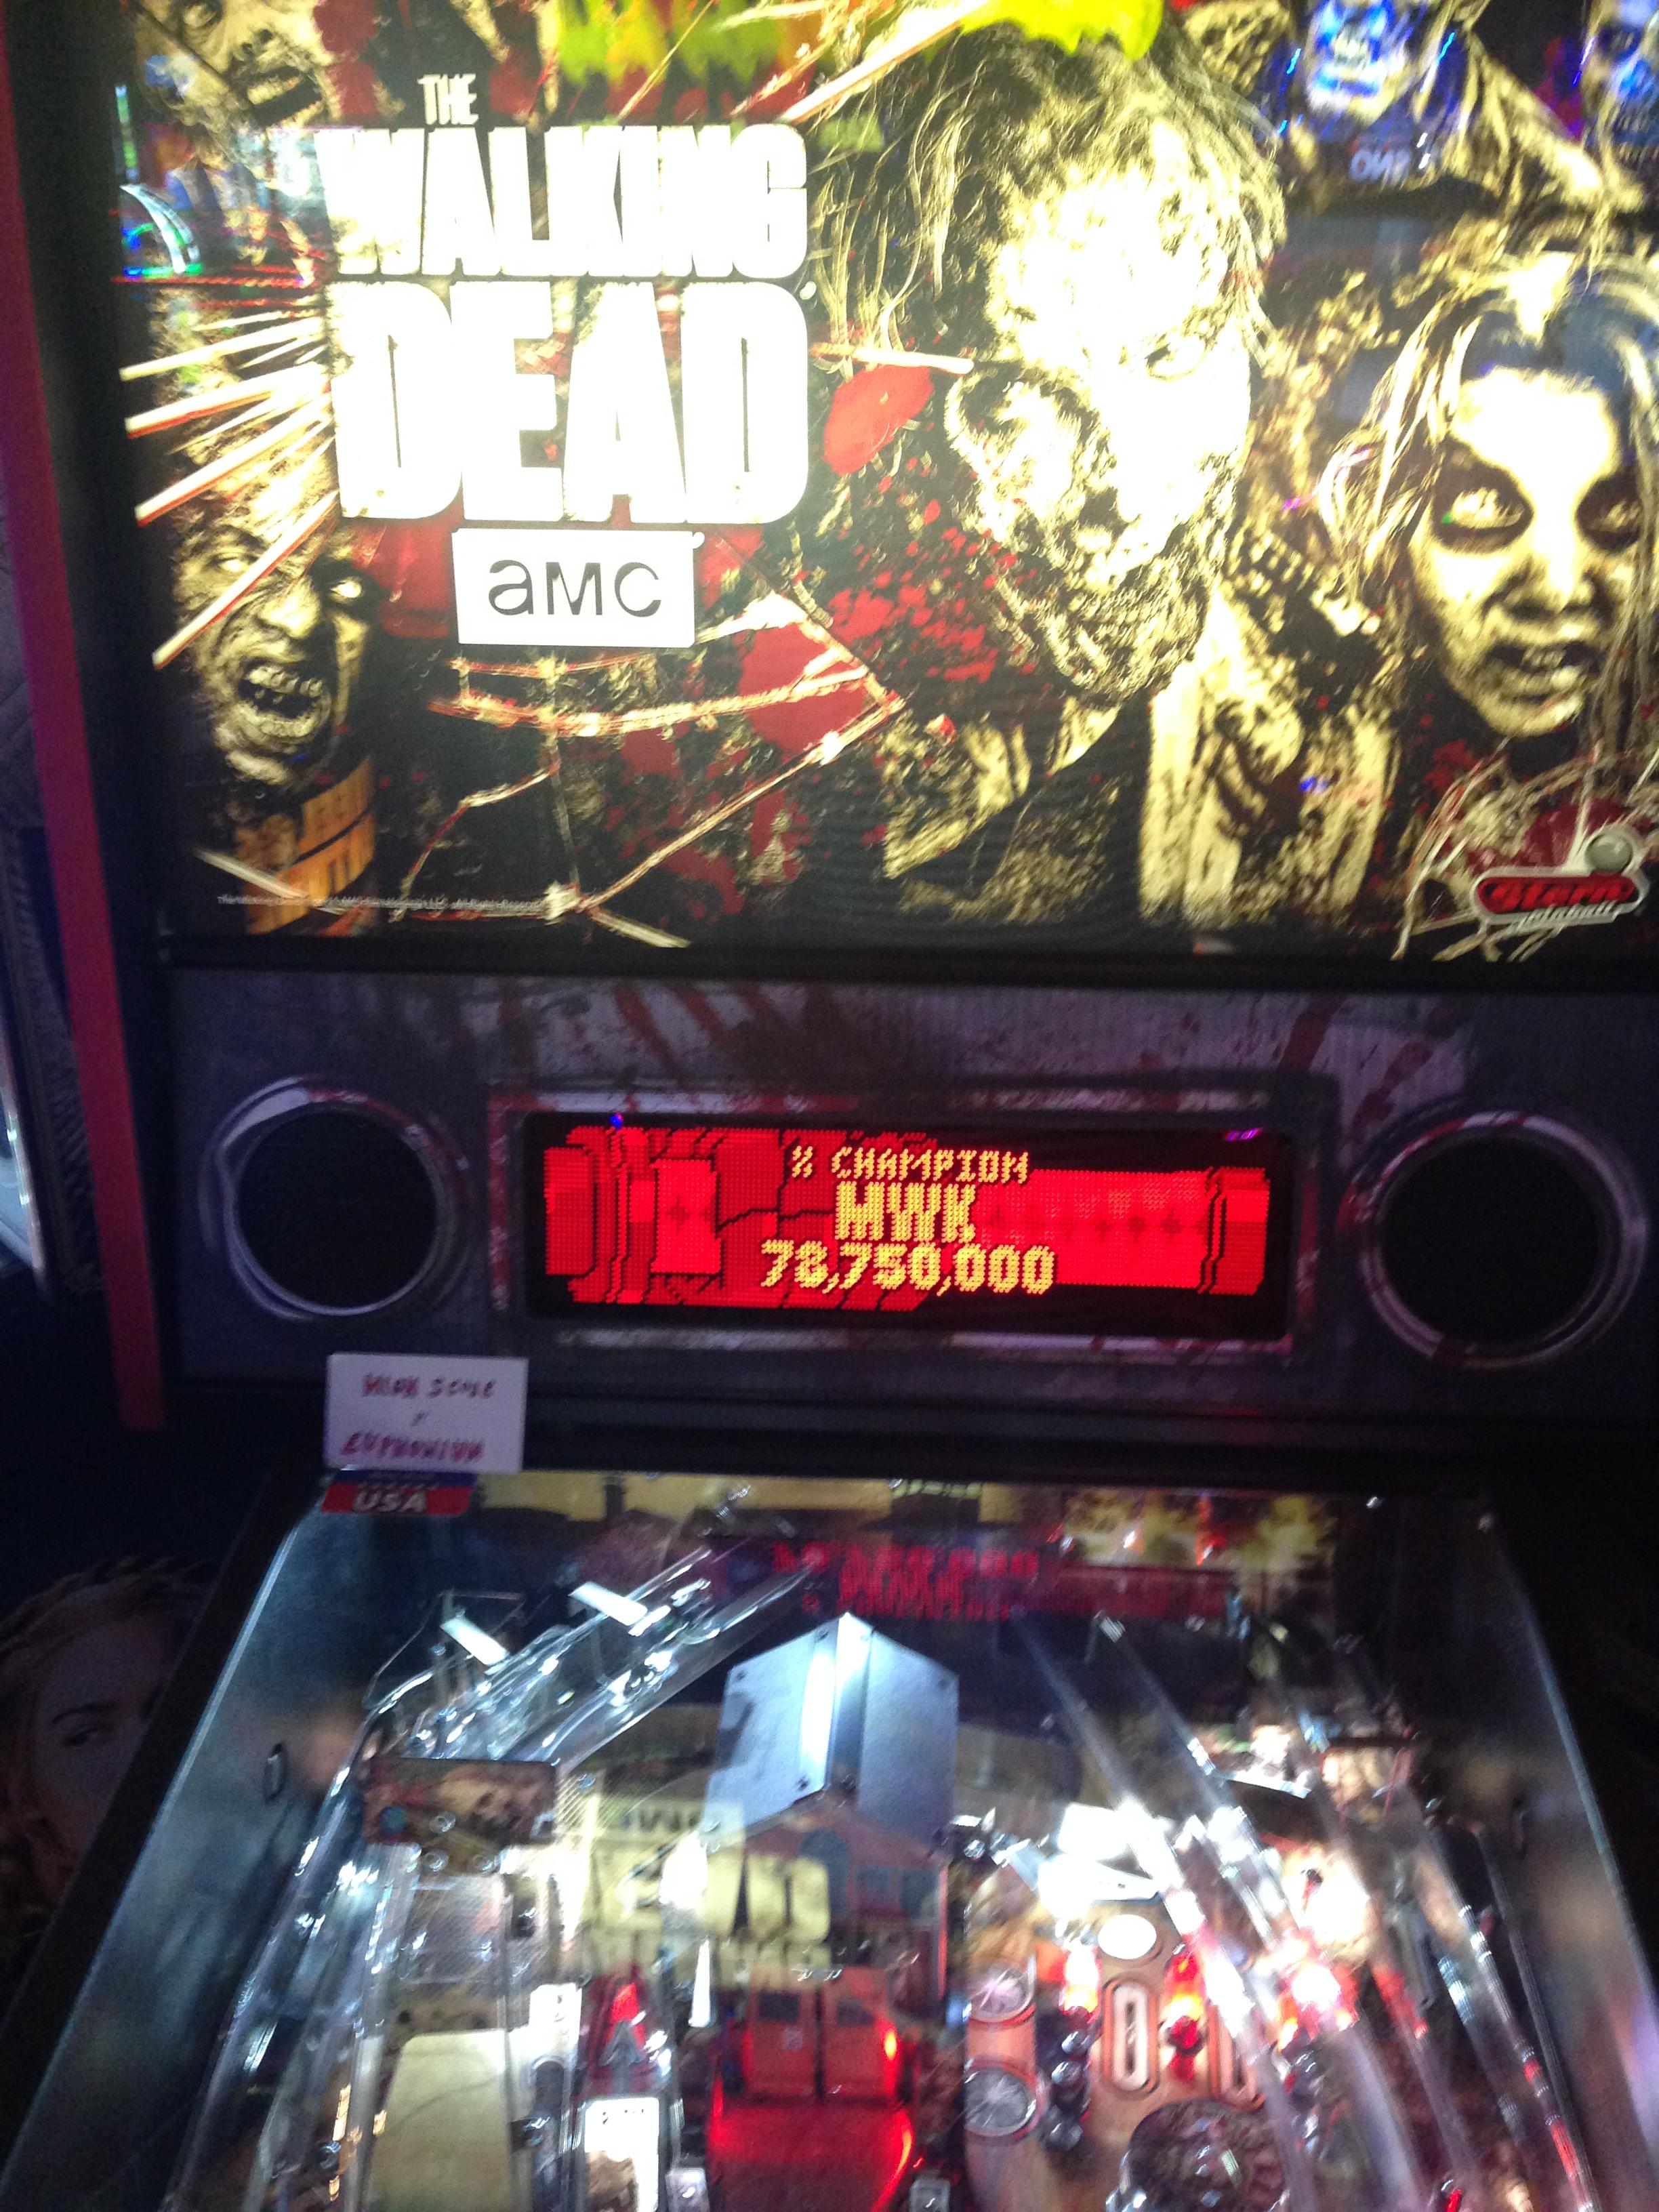 euphonium: The Walking Dead: X Champion (Pinball Bonus Mode) 78,750,000 points on 2017-02-22 23:56:45